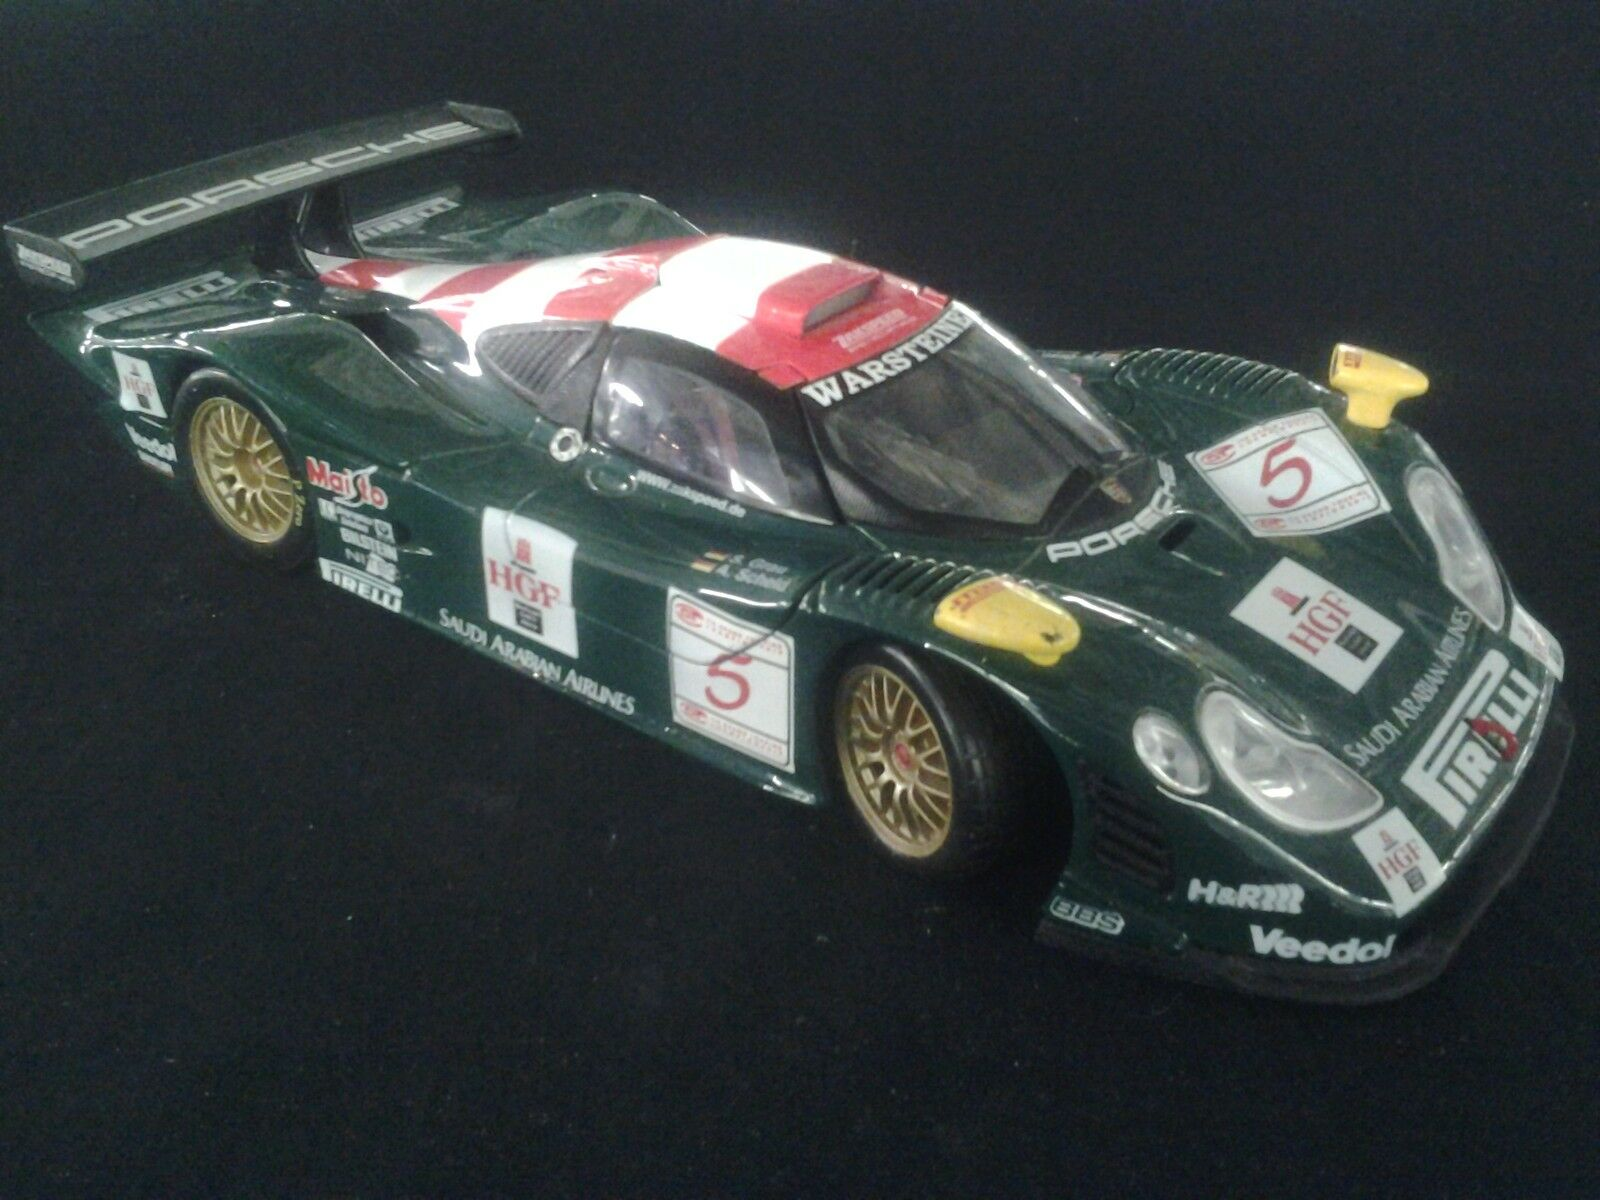 Compra calidad 100% autentica Maisto Zakspeed Racing Porsche 911 911 911 GT1 1998 1 18  5 gris   Scheld FIA GT (MCC)  autentico en linea